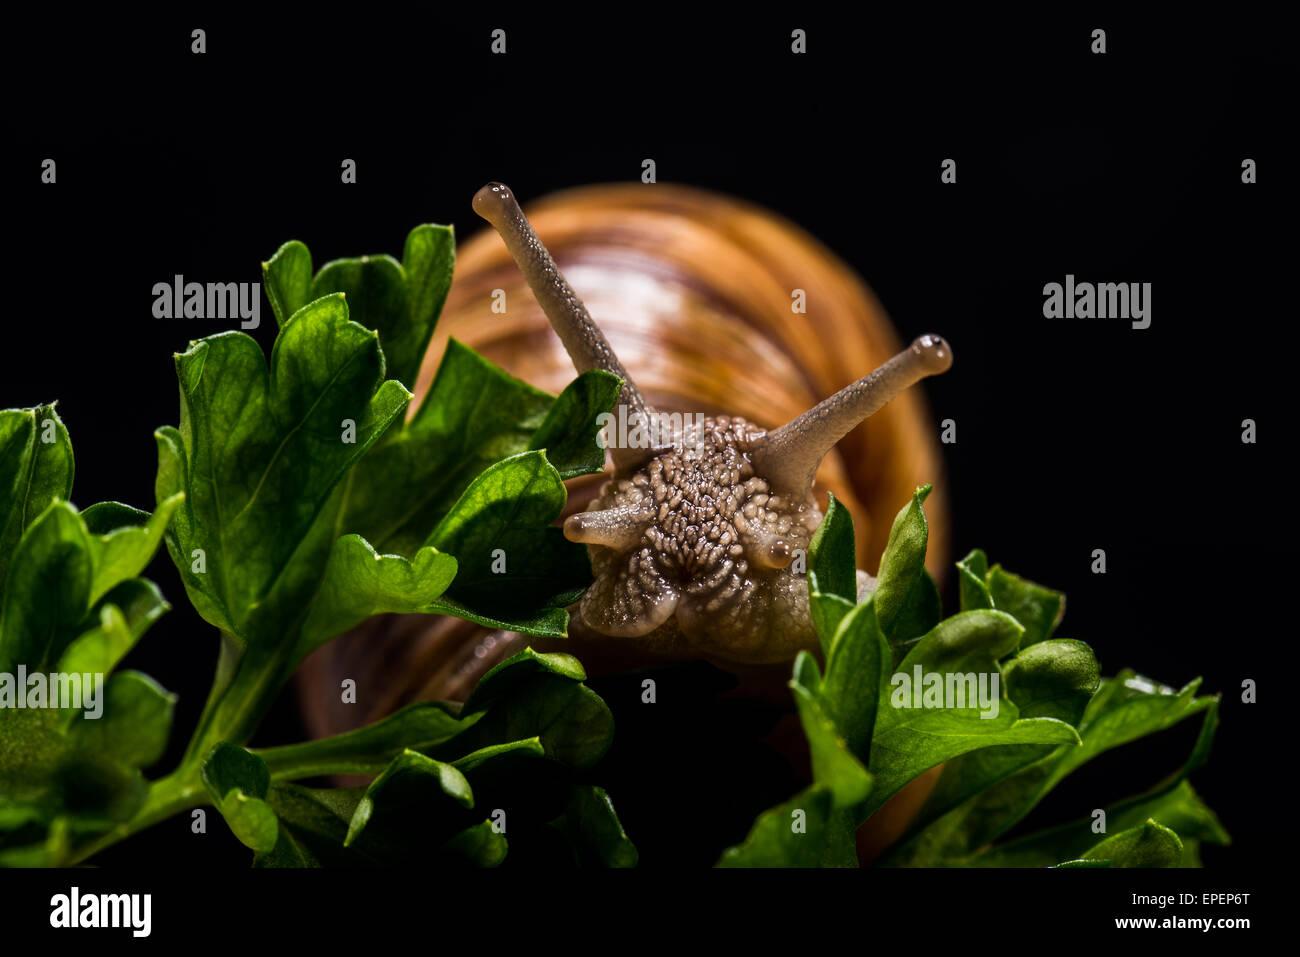 Snail Vineyard in studio, portrait animal pest eats vegetables, longing eyes Telescope Eyes stalk eyes stalking - Stock Image